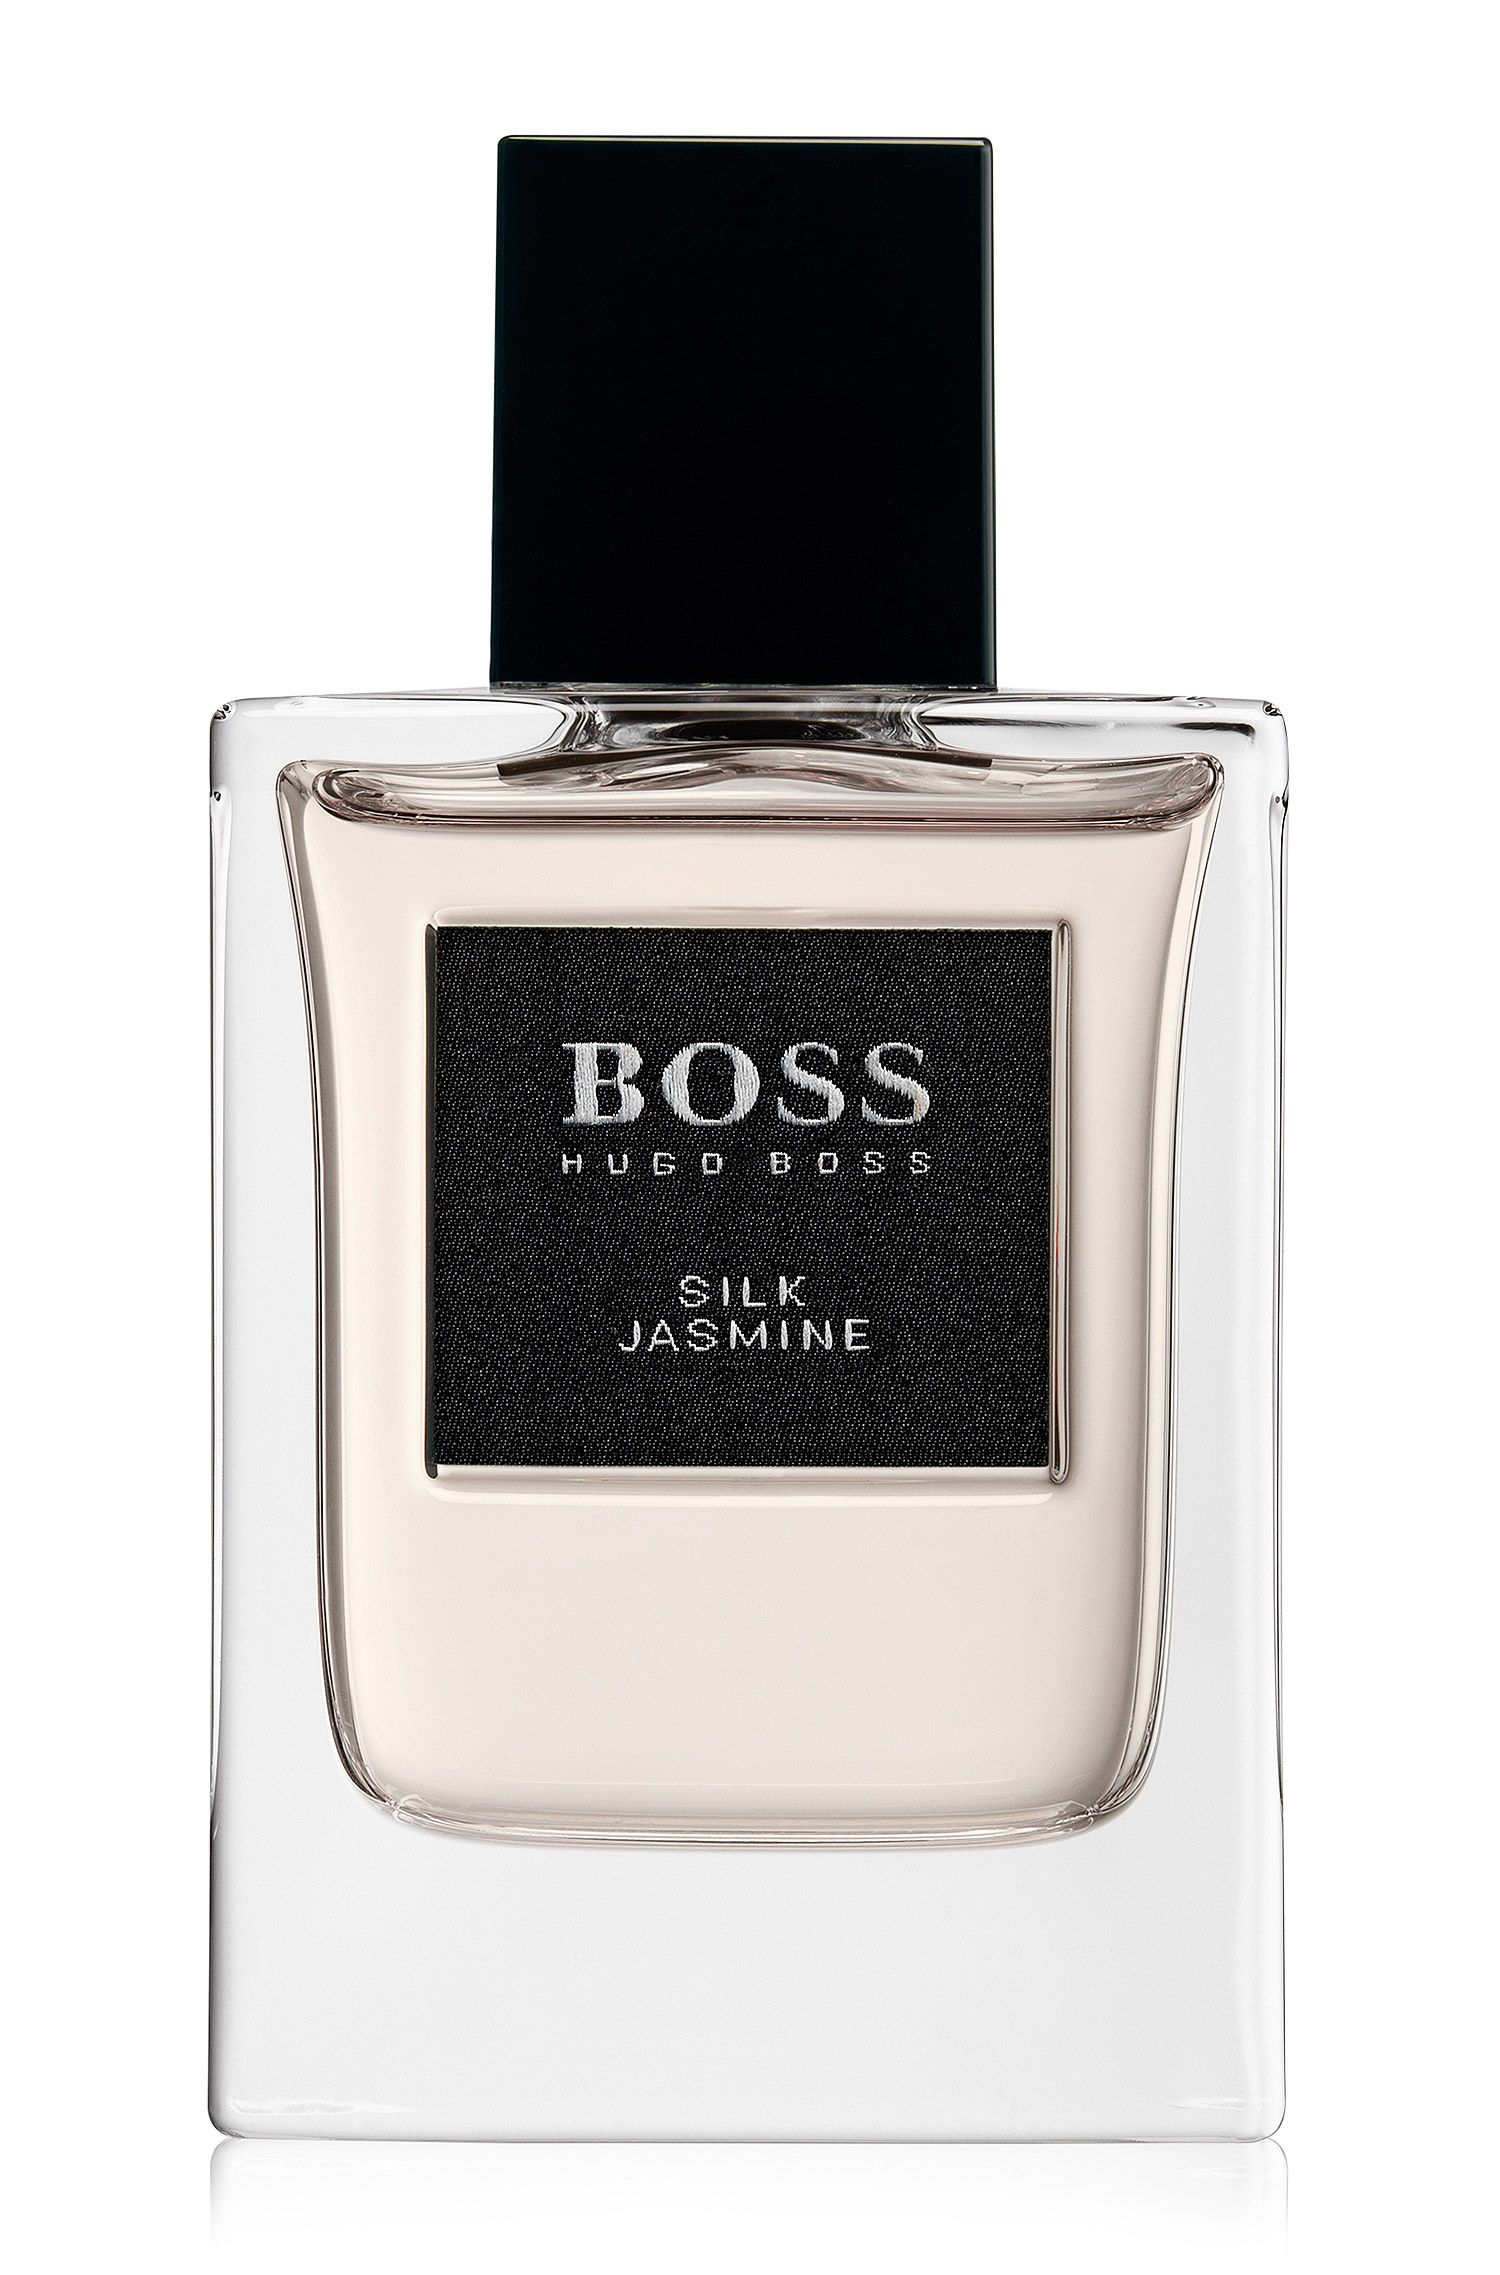 BOSS The Collection - Silk Jasmine Eau de Parfum